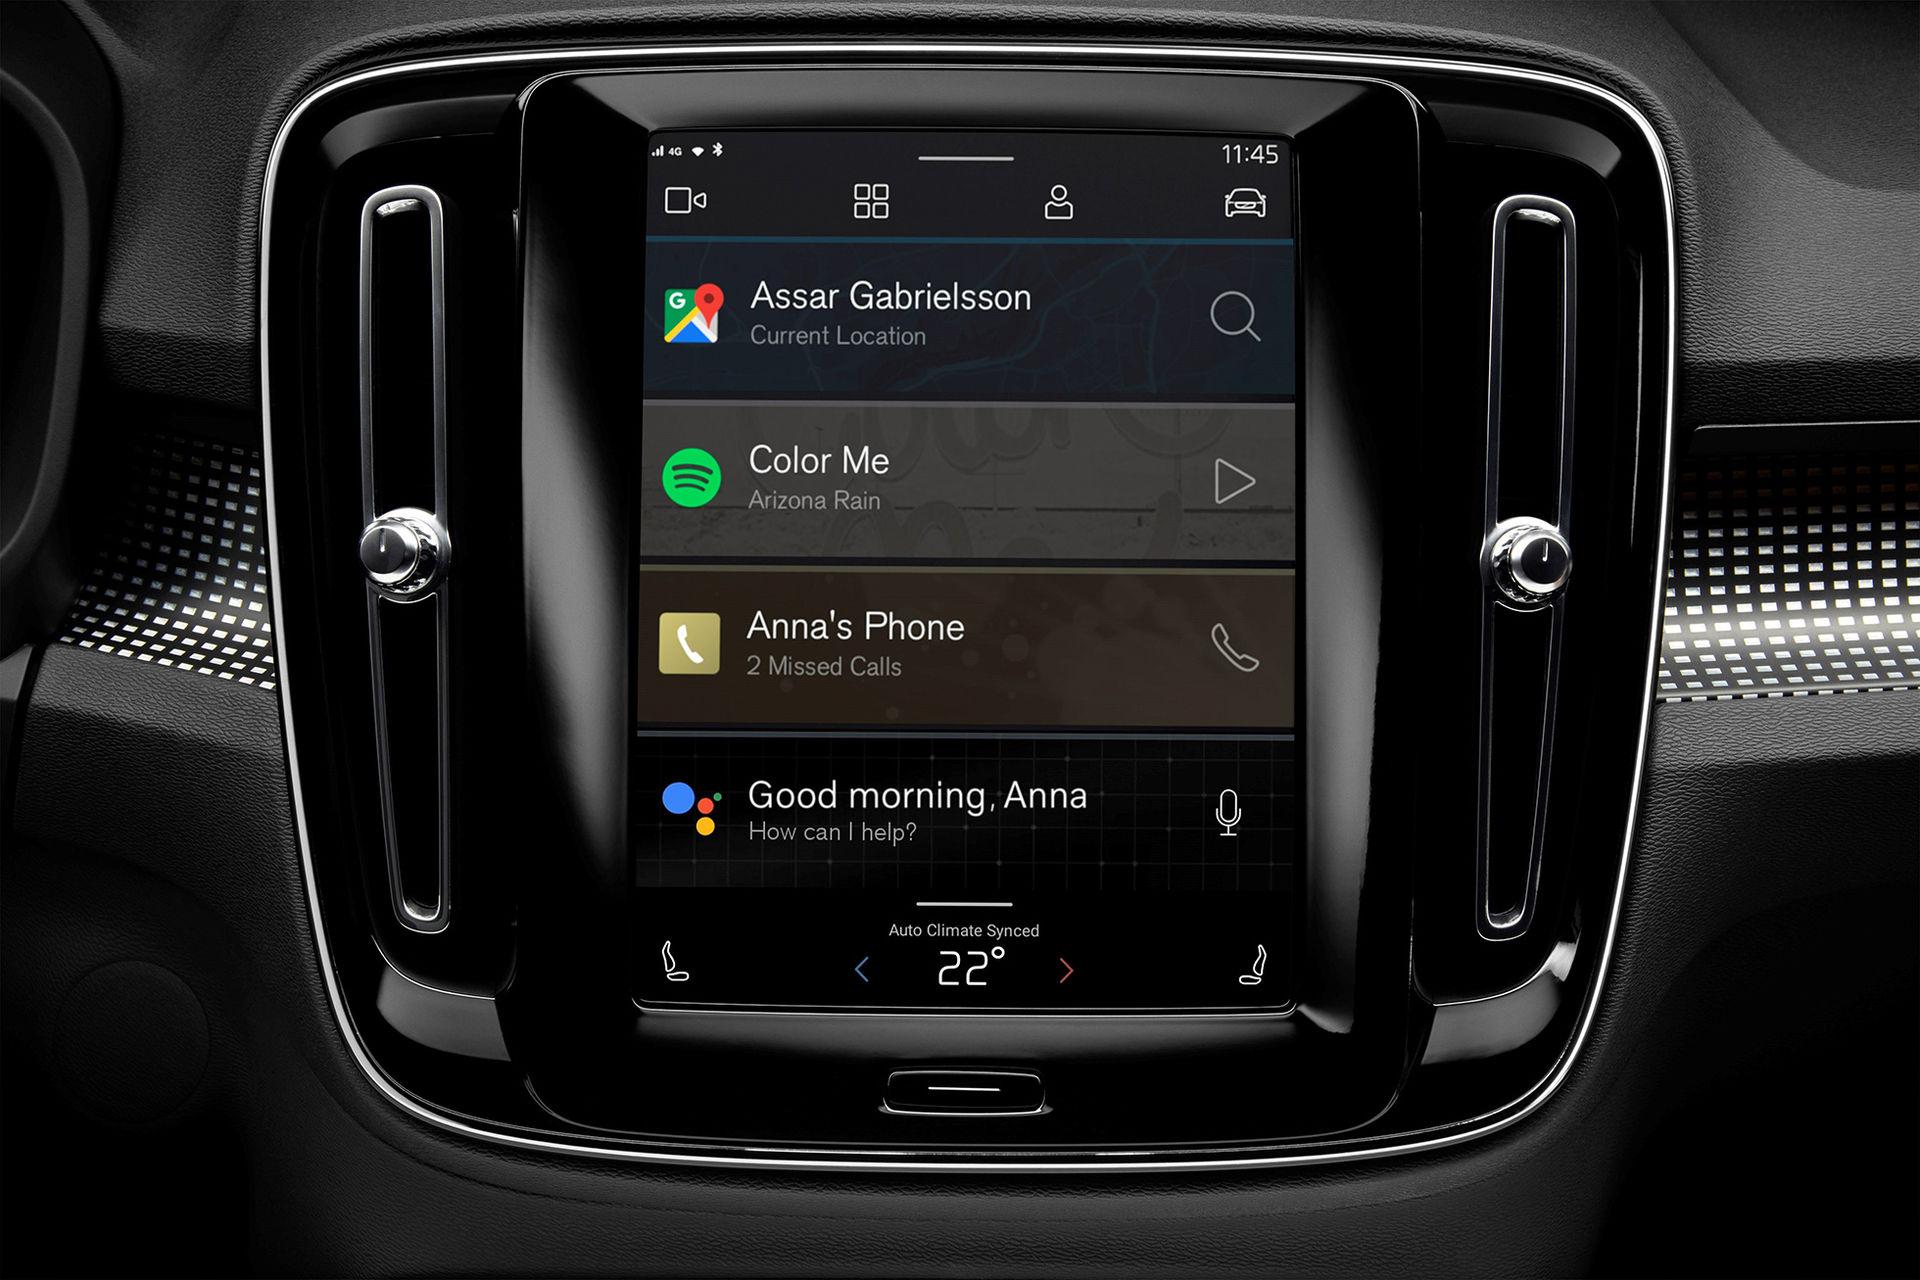 Eldrivna Volvo XC40 får helt nytt infotainmentsystem